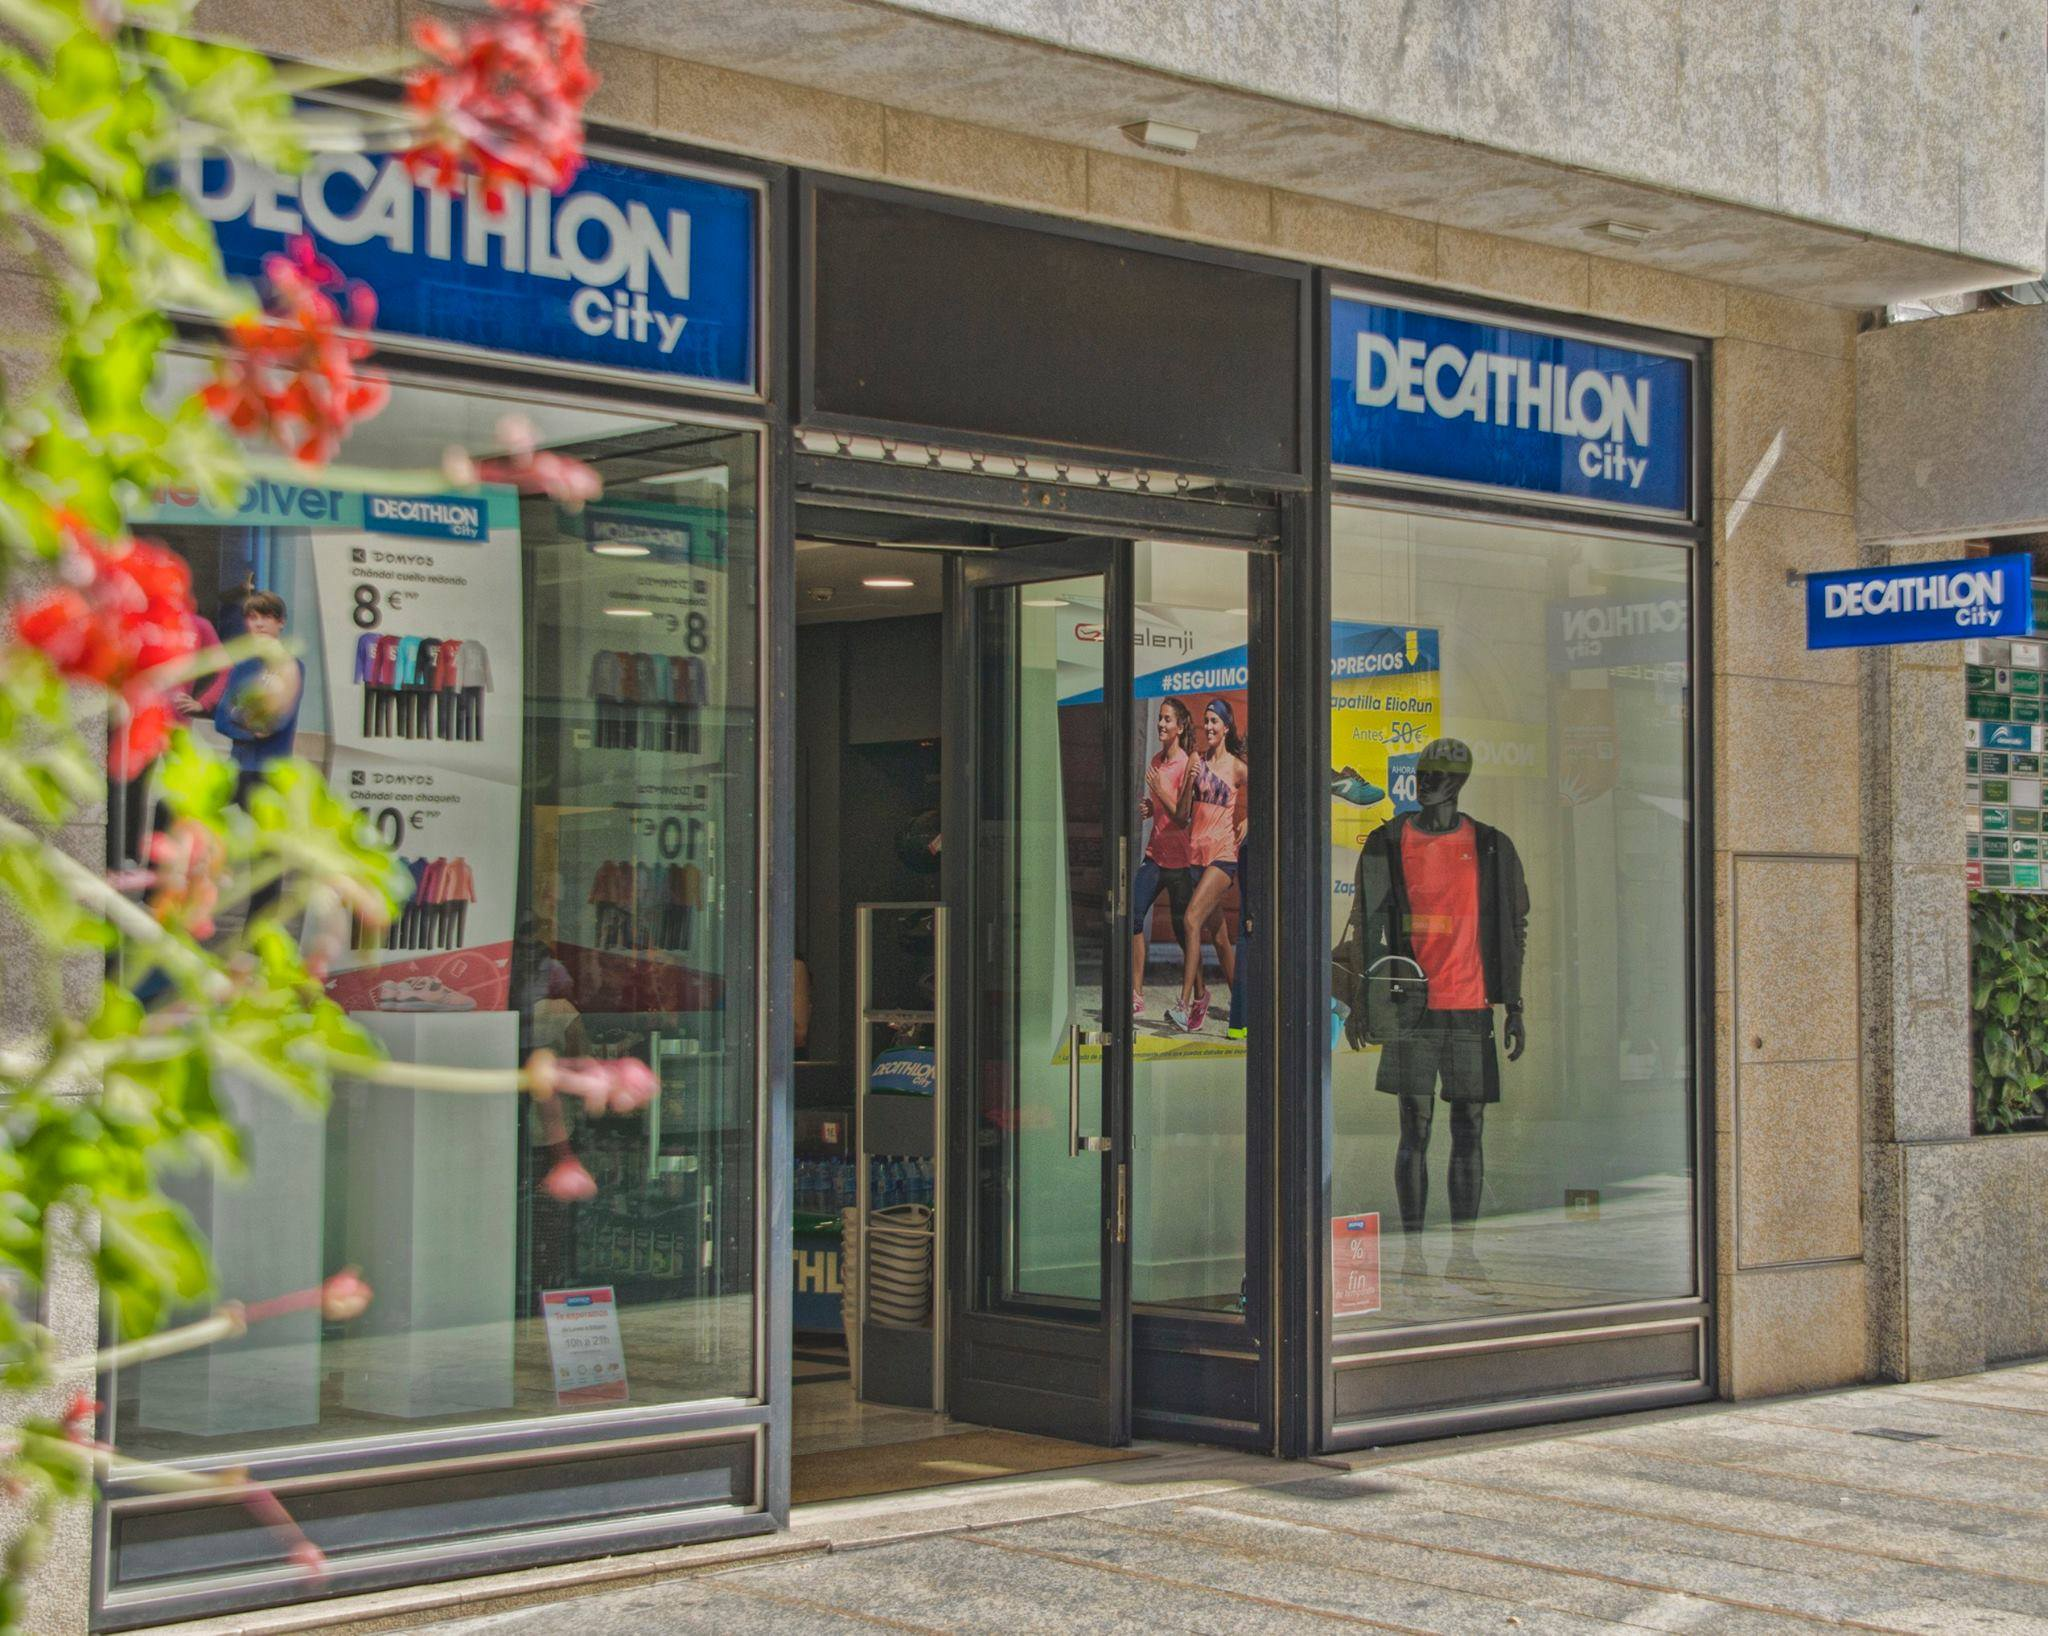 Decathlon contin a su expansi n en espa a per retail for Trabajar en decathlon madrid